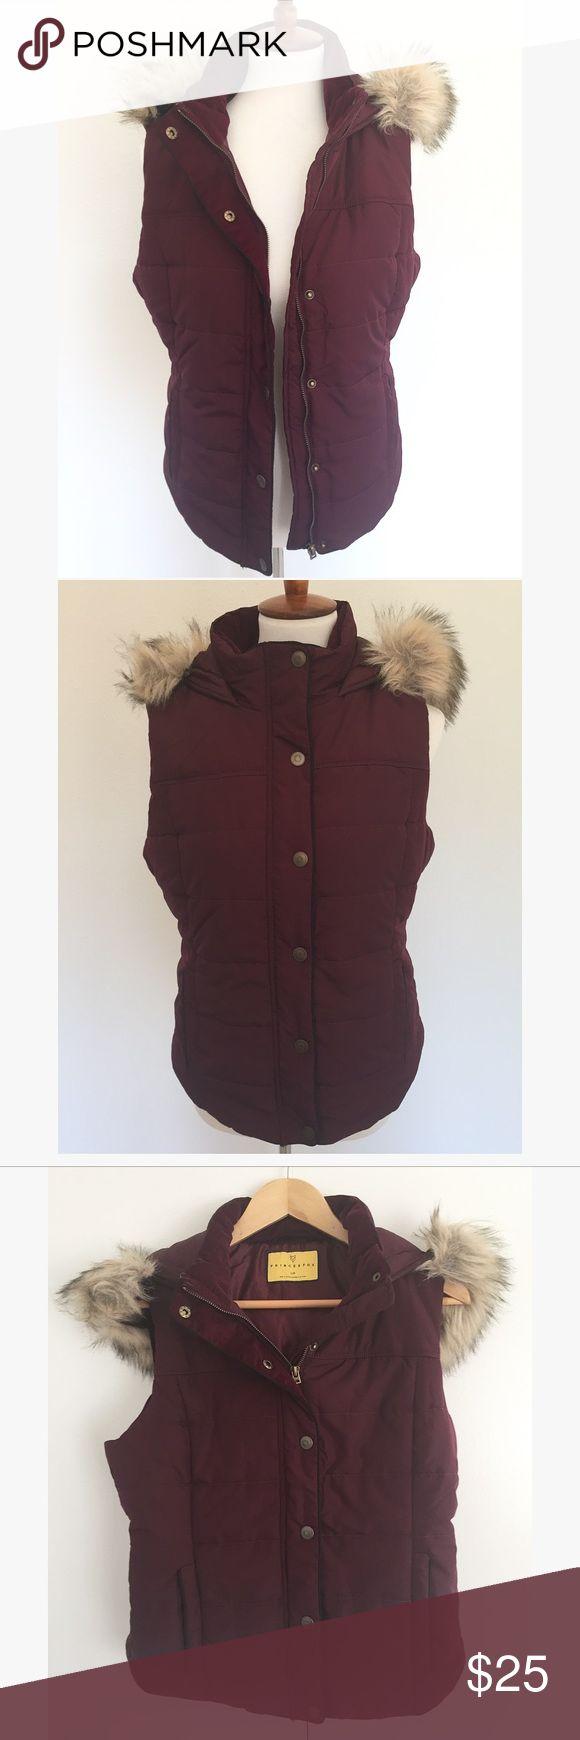 PRINCE & FOX • purple vest Size L • fur vest • gently worn no flaws Aeropostale Other